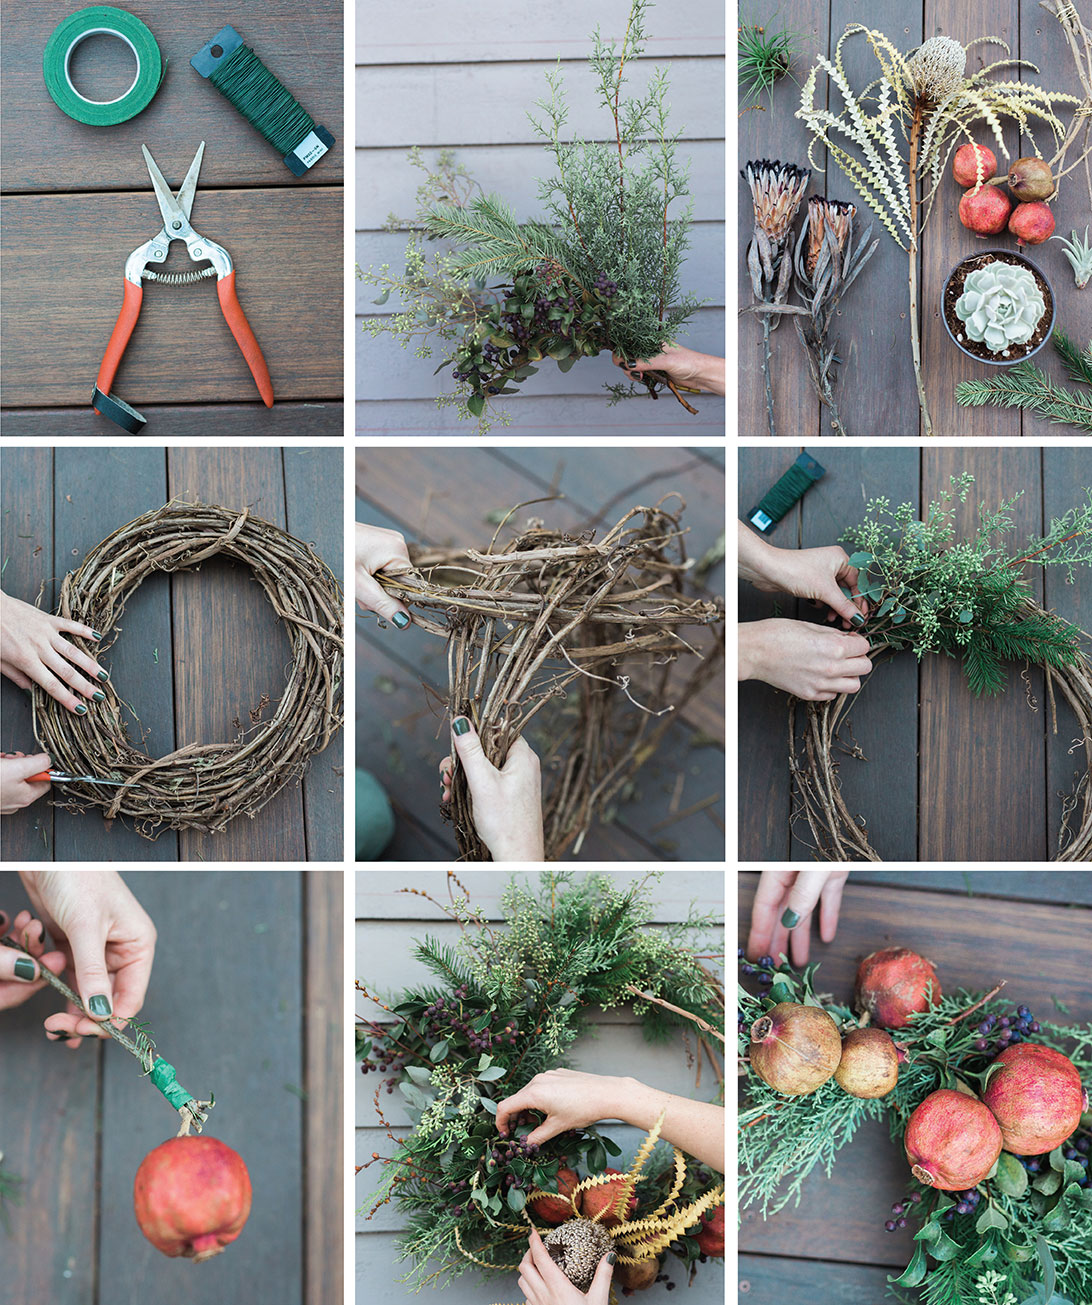 DIY wreath instructions how to Native Poppy Natalie Gill holiday